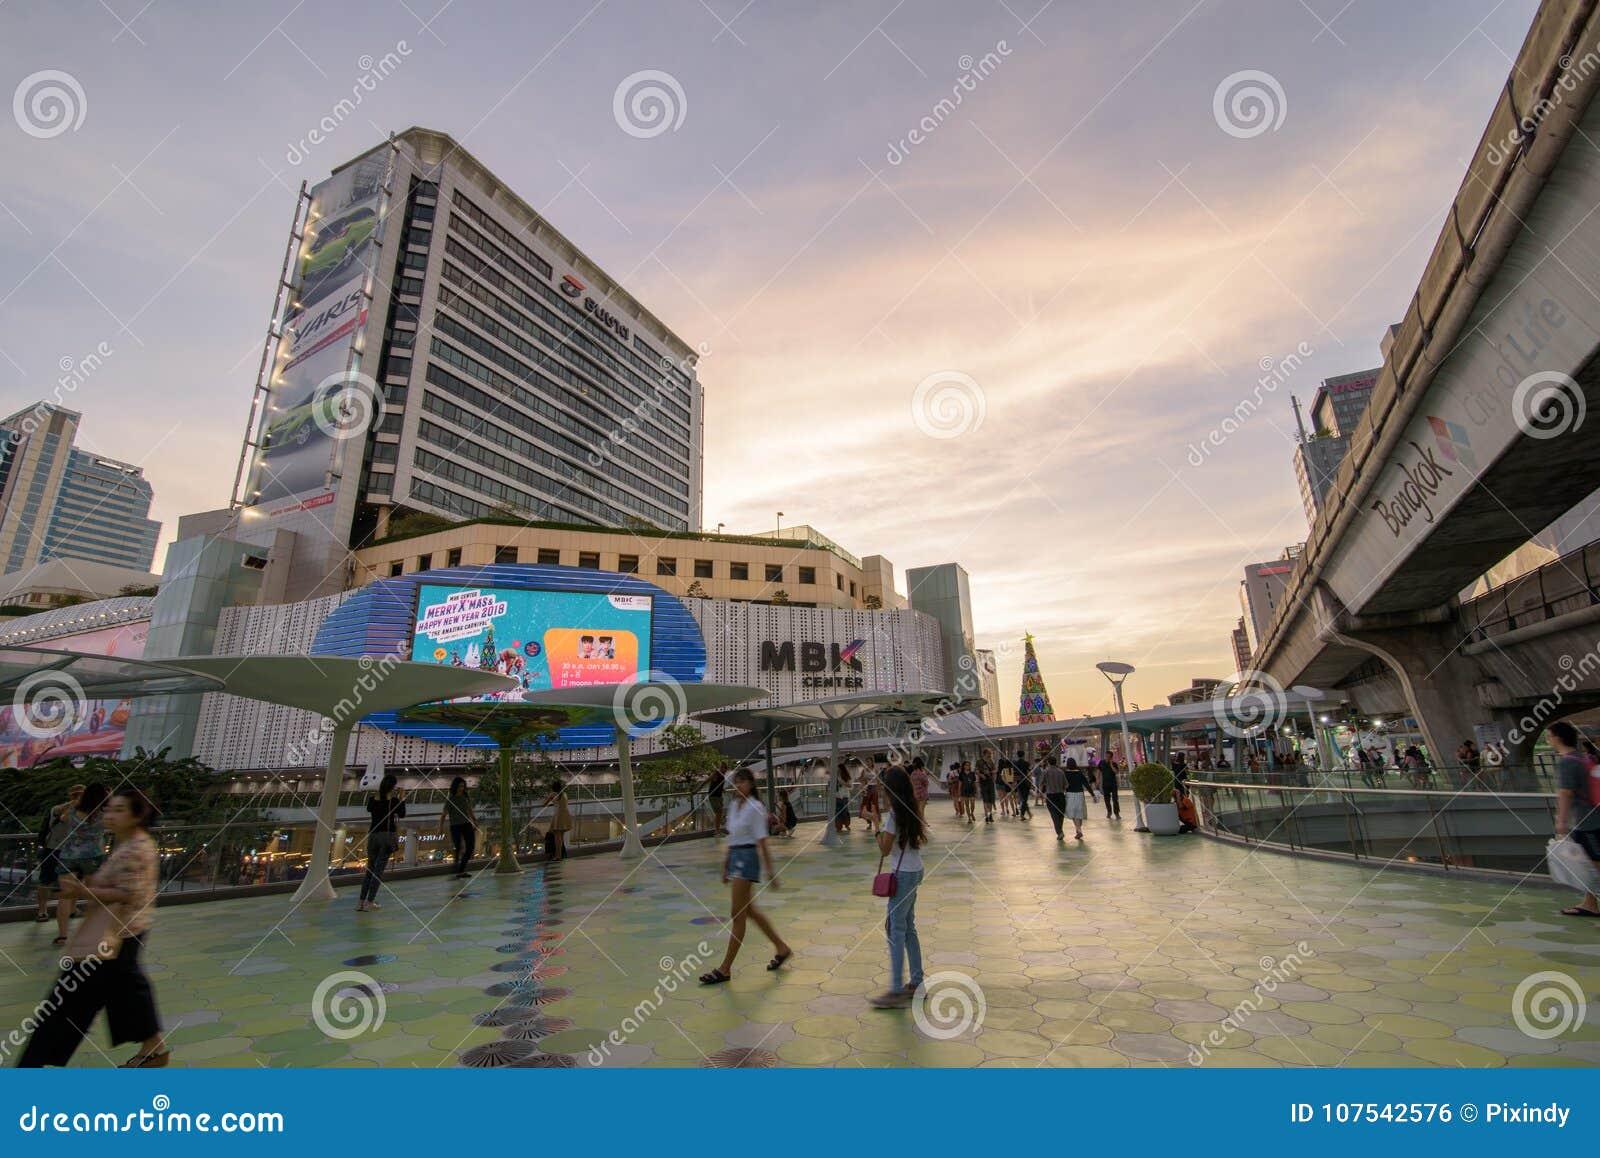 Bangkok, Thailand- January 07, 2018 : MBK Center, Also